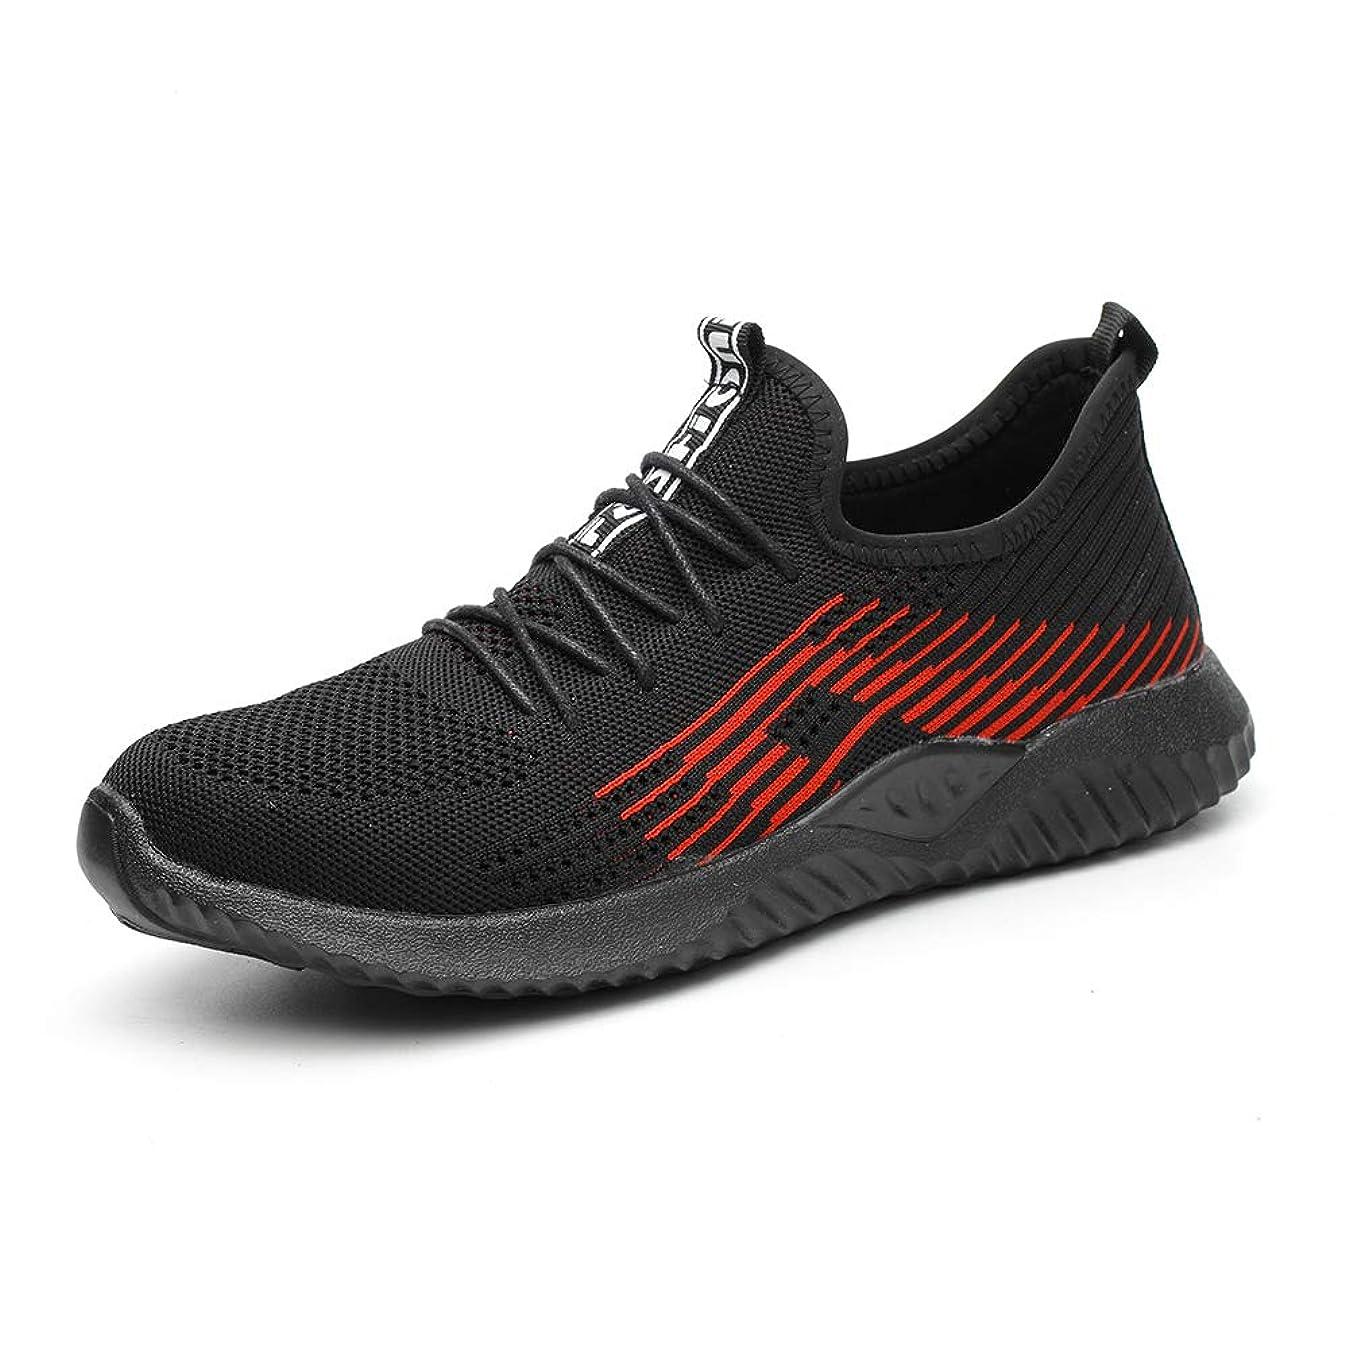 [JACKS HIBO] 安全靴 スニーカー 作業靴 セーフティーシューズ 鋼先芯 メッシュ 超通気 夏場対応 クッション性 防滑 防臭 耐摩耗 メンズ レディース 115 ブラック 39